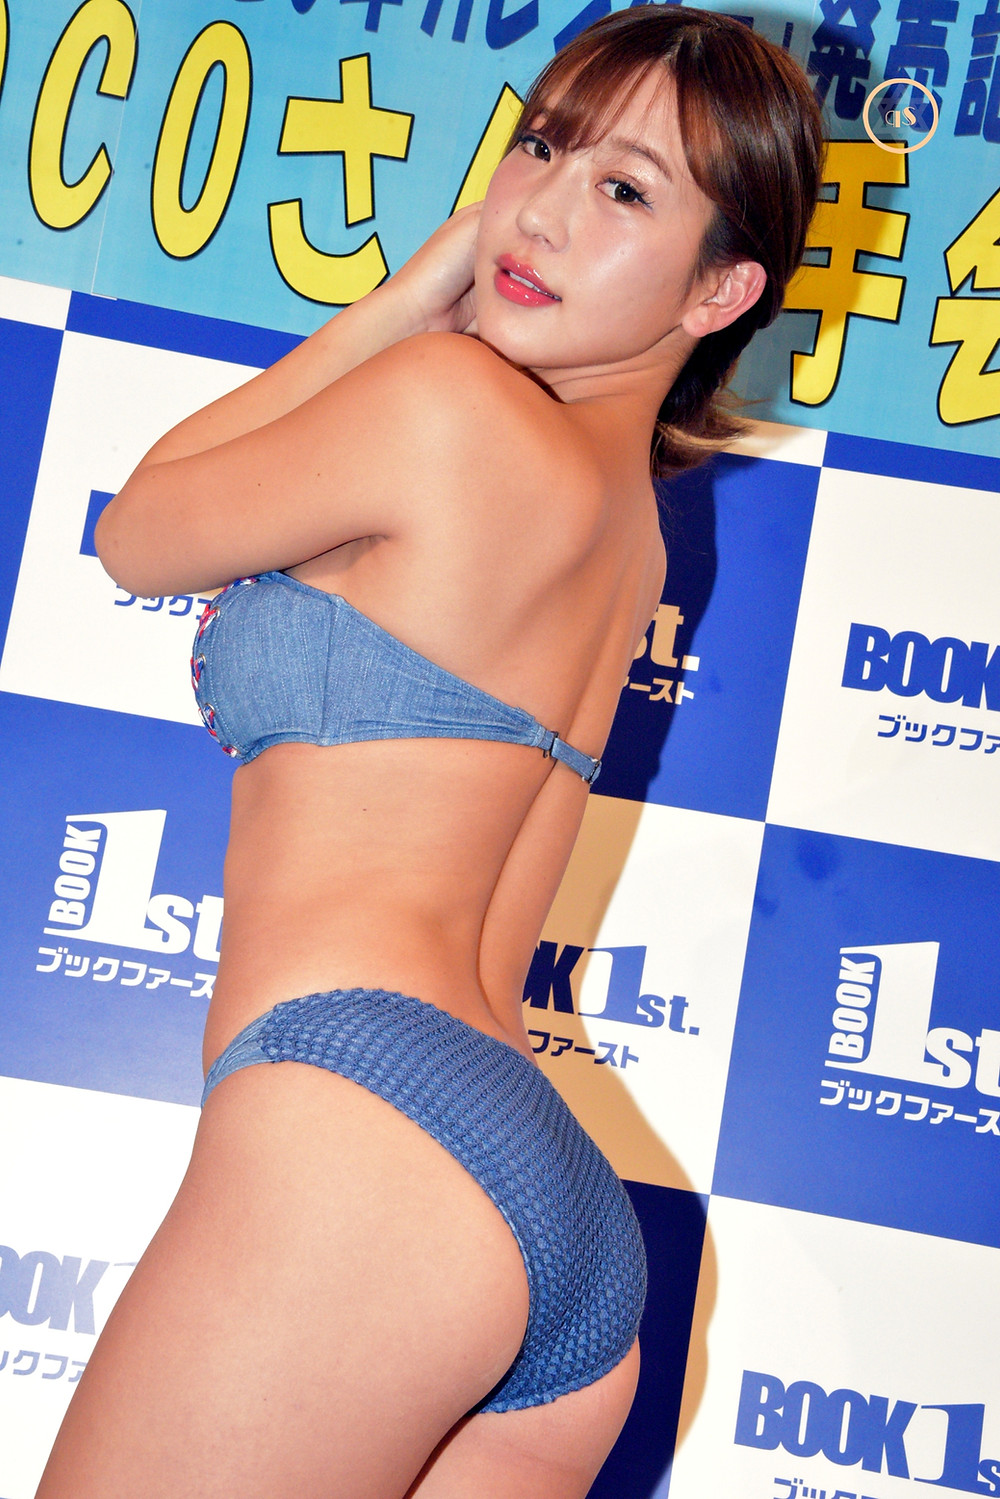 COCO(巨乳美尻グラドル)2020年カレンダー (7)